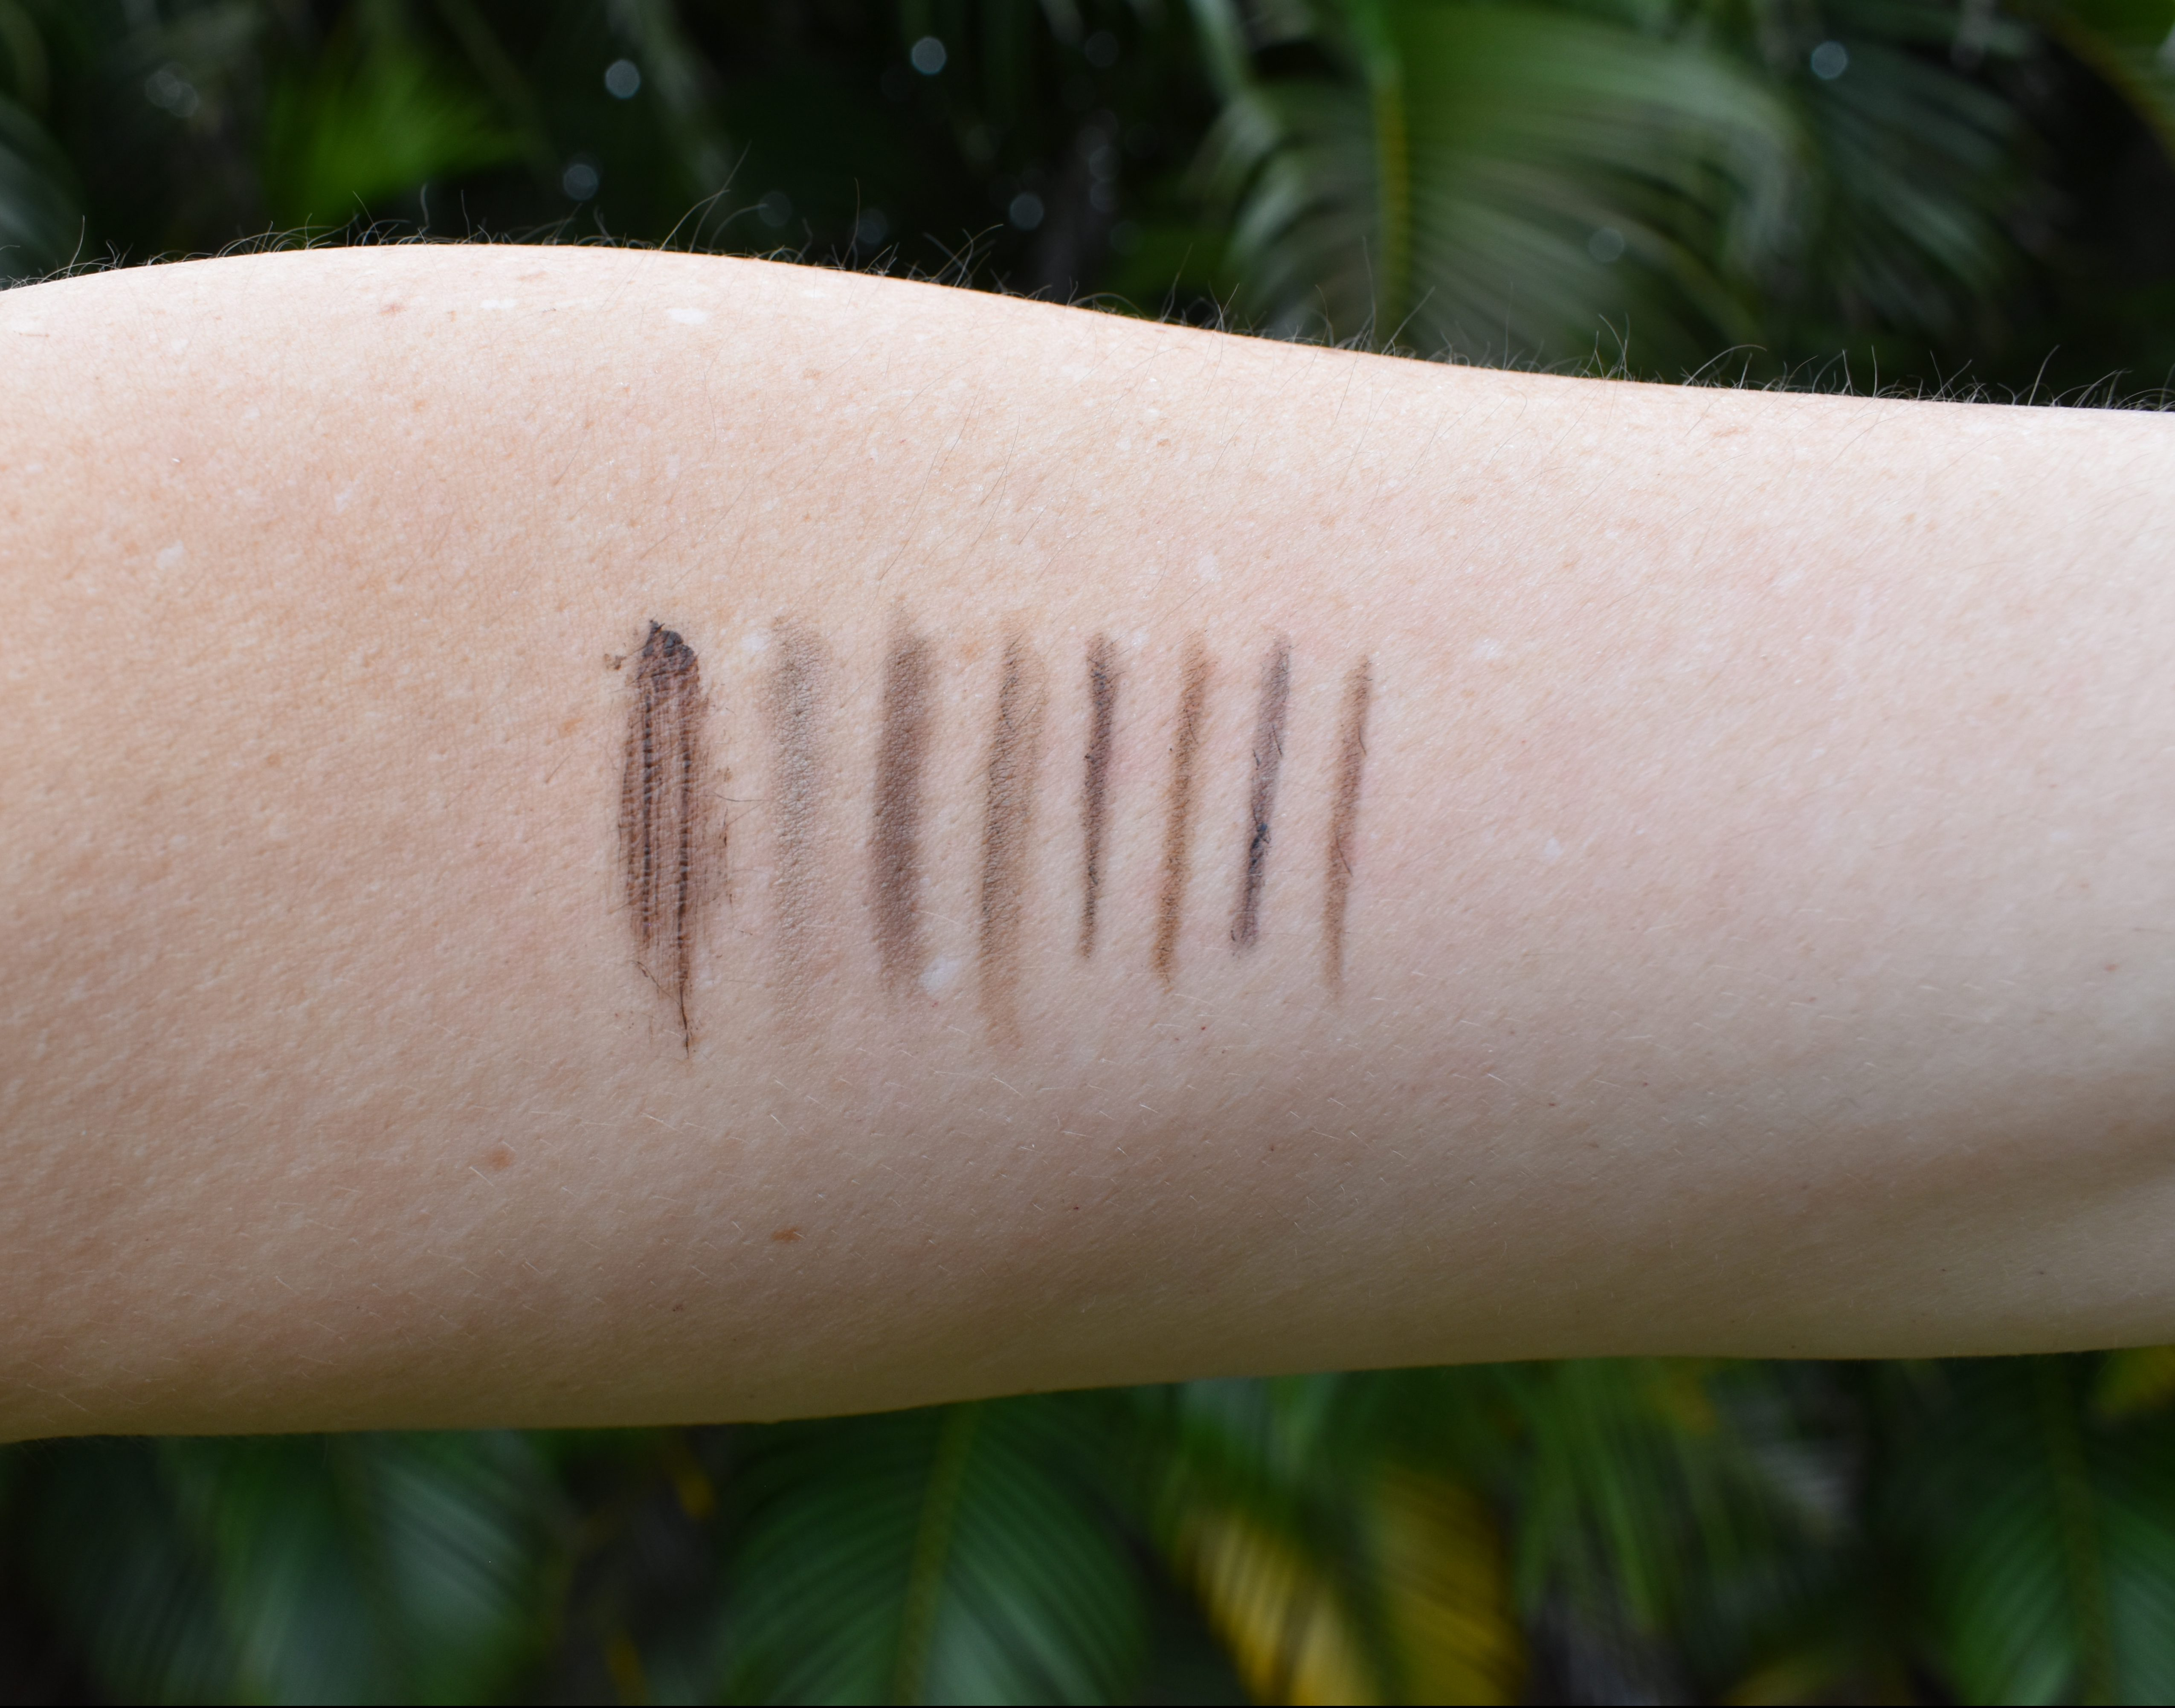 brow pencils swatch, brow comparisons, brow pencils, brunette brows